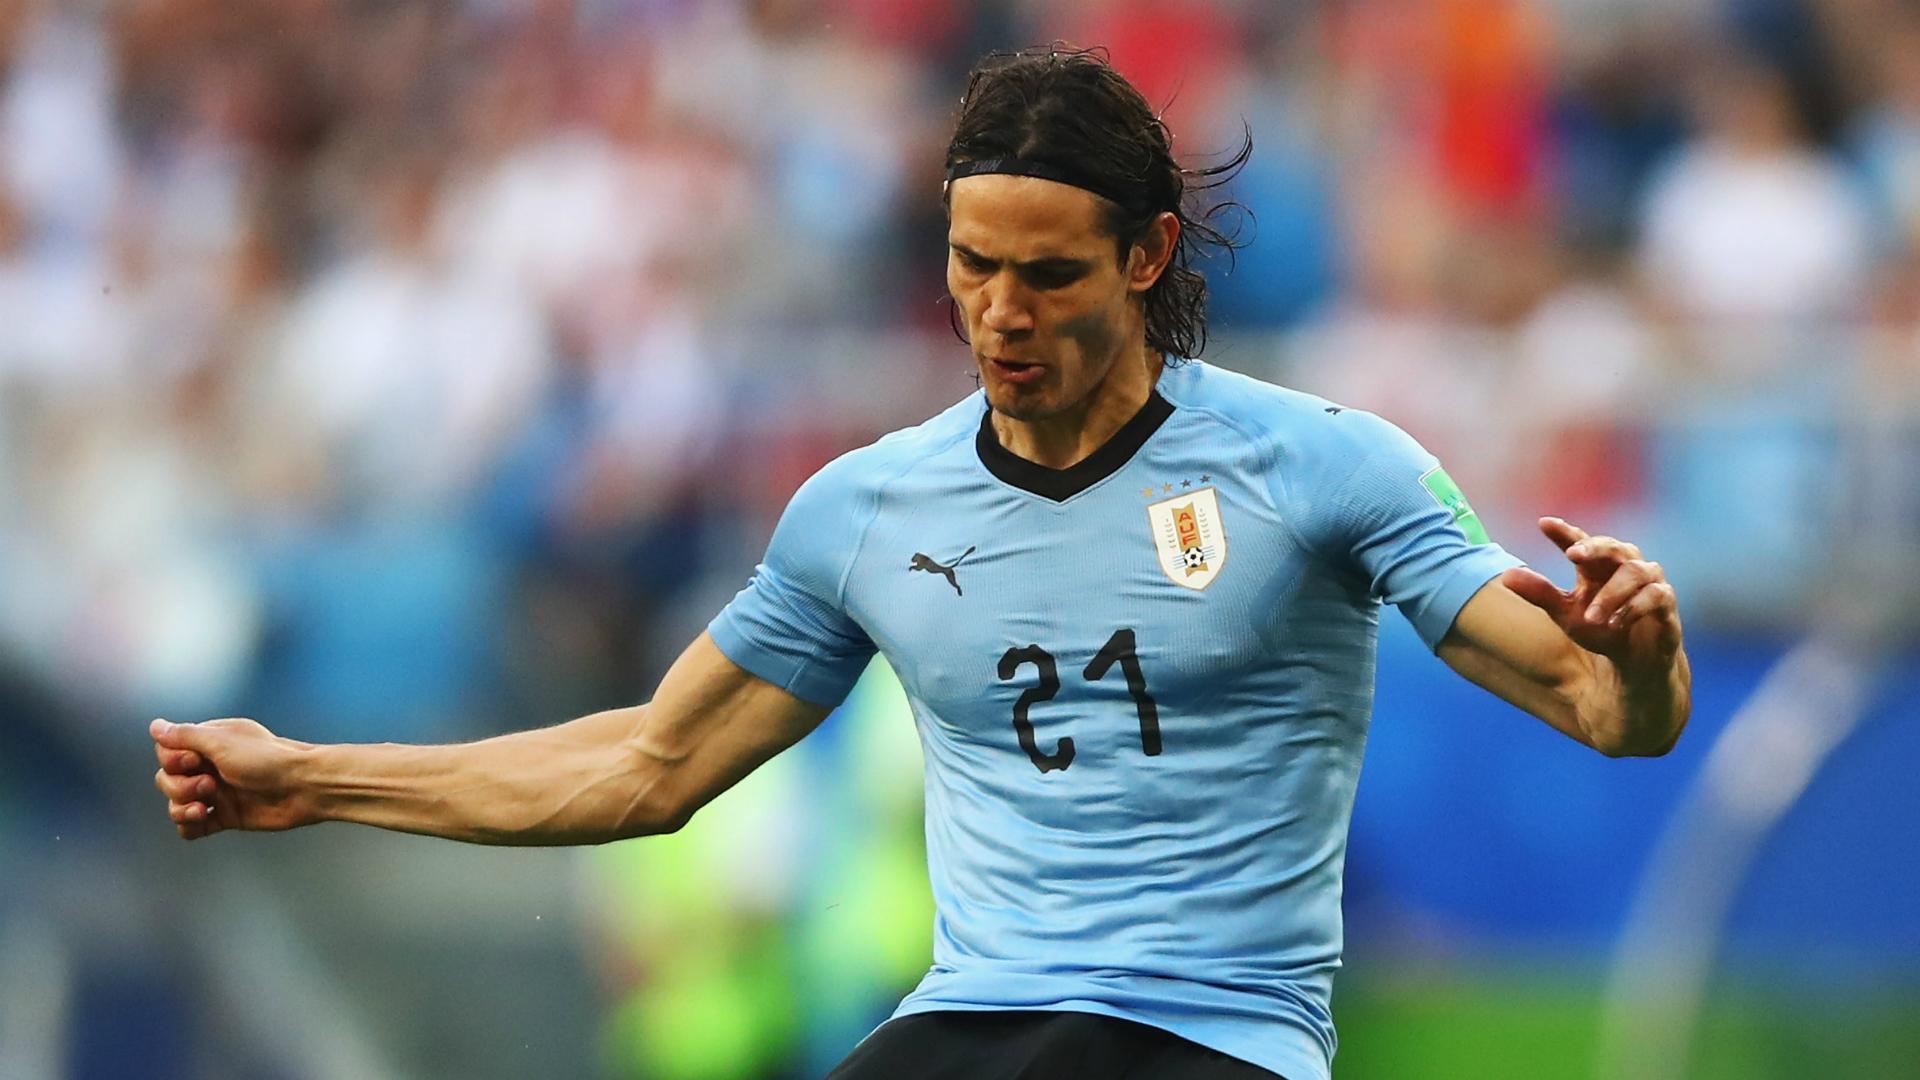 World Cup 2018: Edinson Cavani's goal sends tearful Cristiano Ronaldo home early